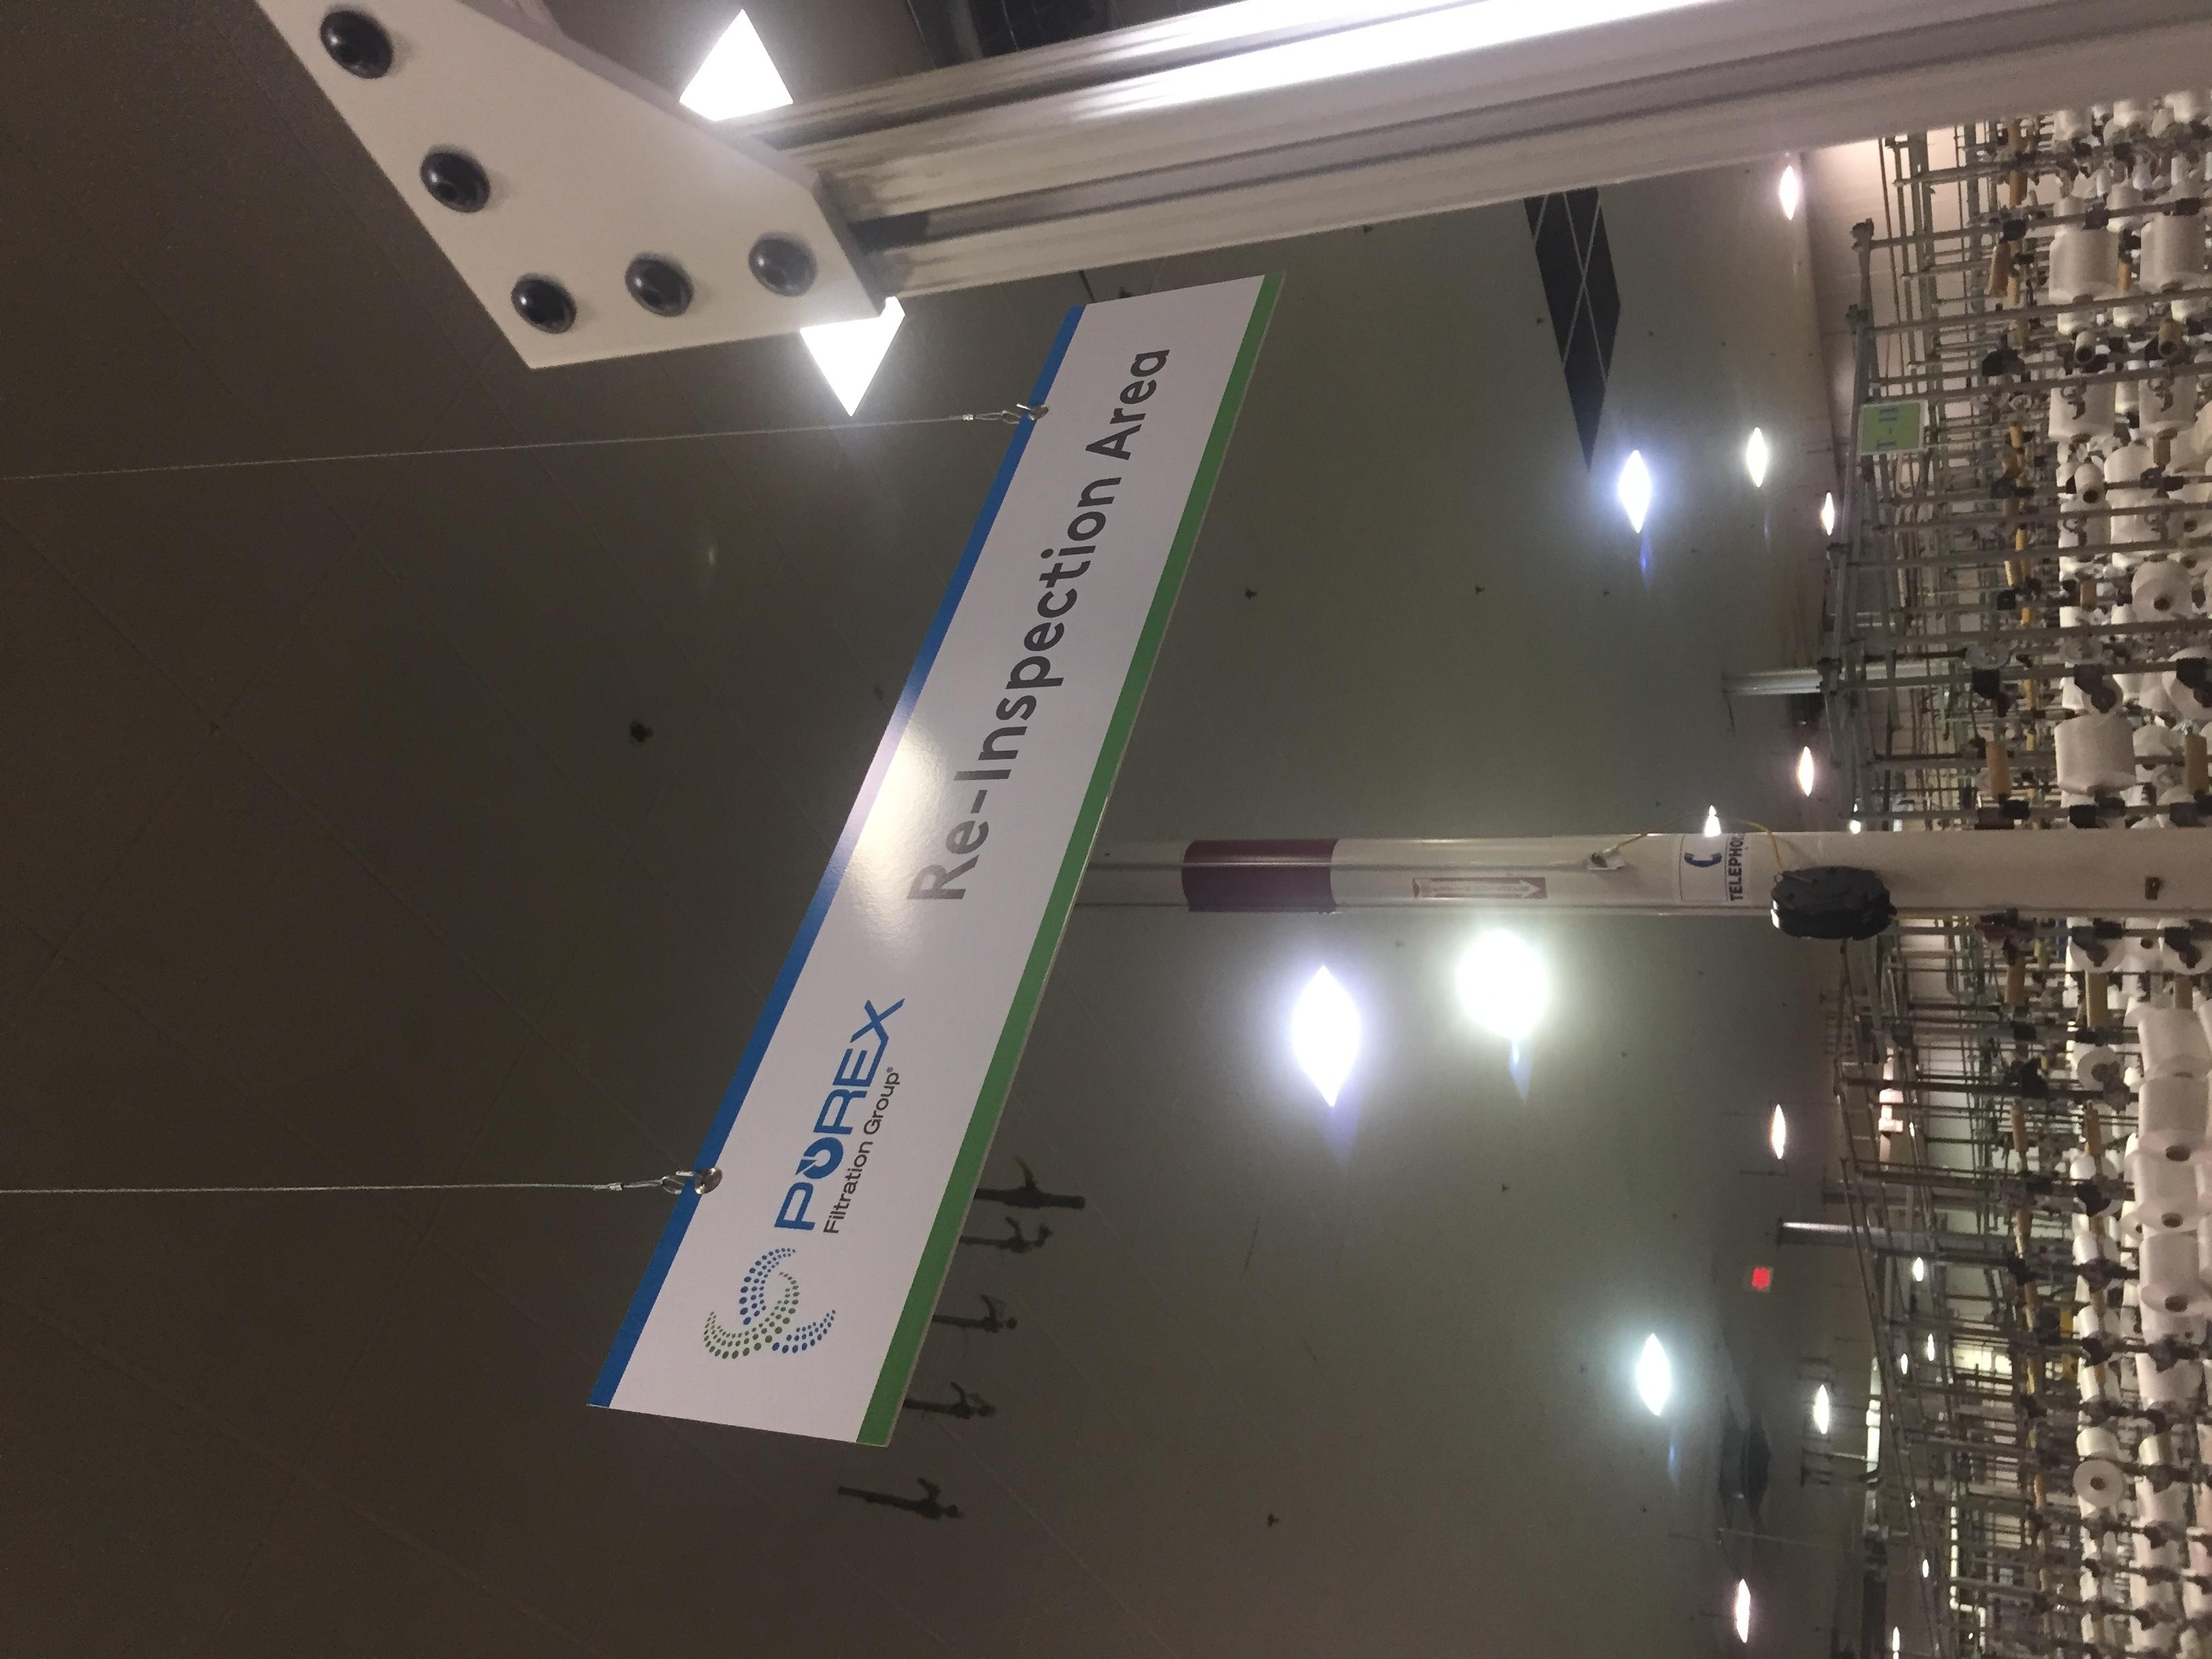 Overhead Informational Interior Signage